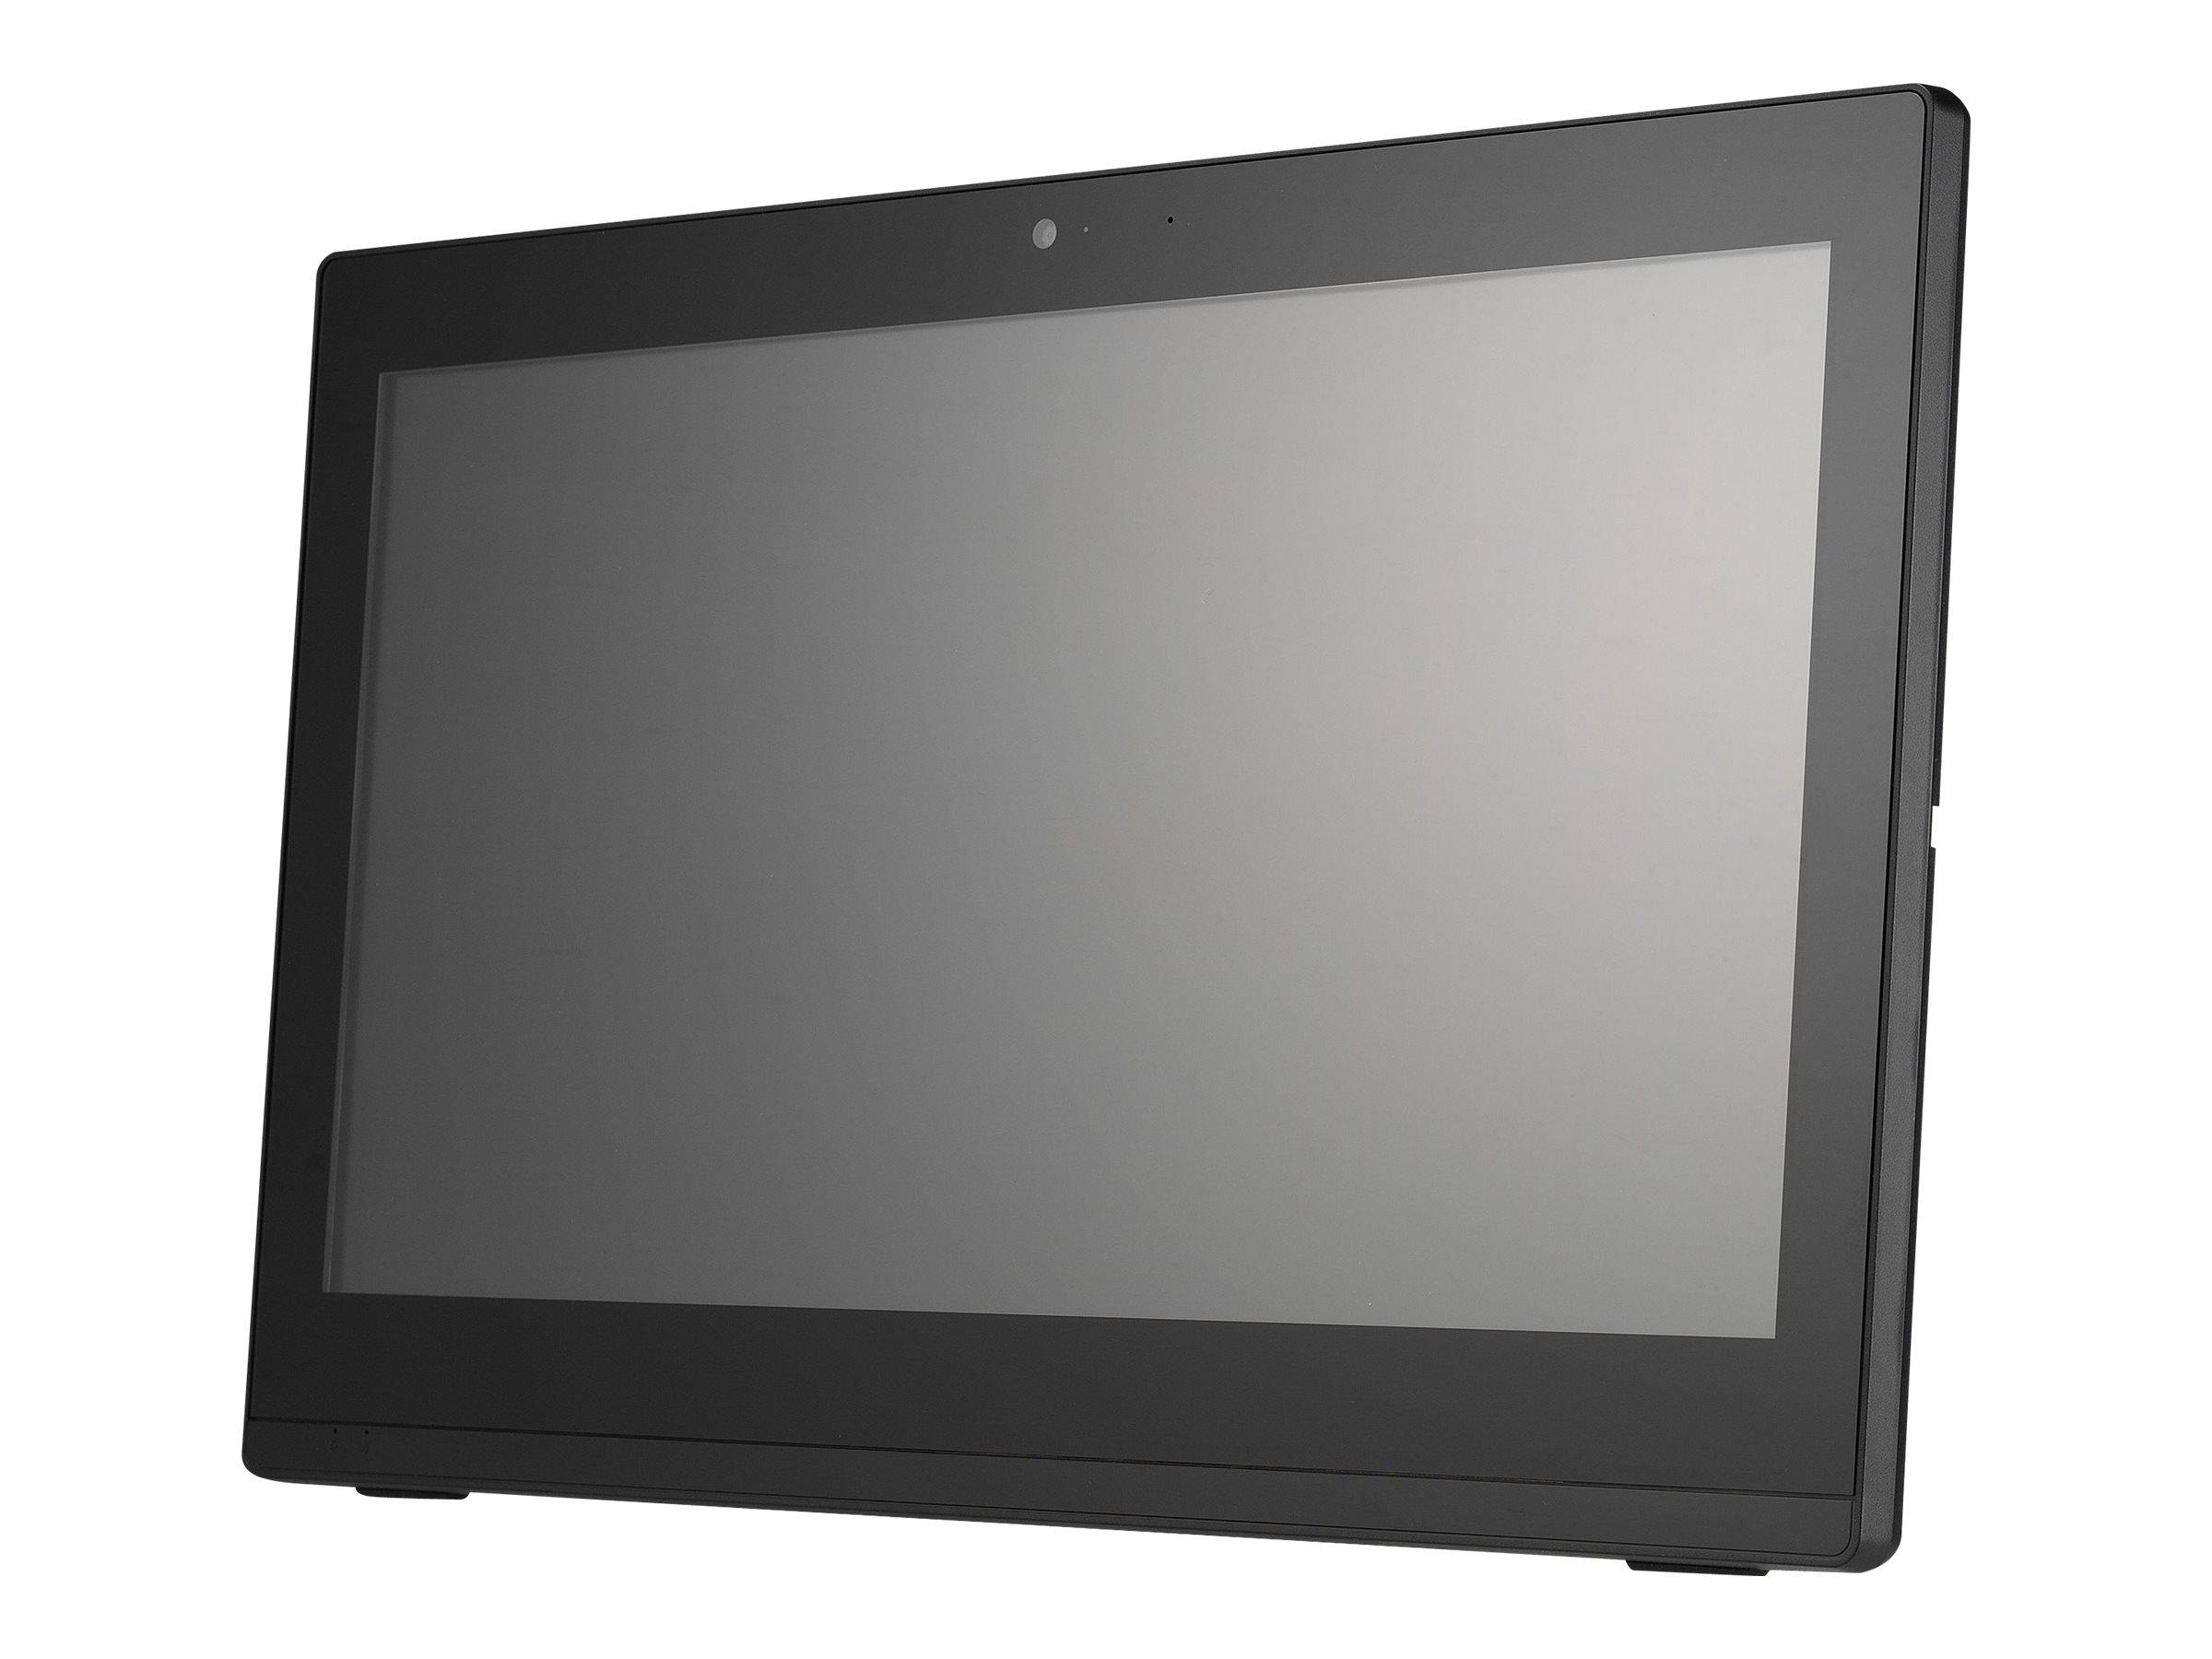 Shuttle XPC P90U5 - Barebone - All-in-One (Komplettlösung) - 1 x Core i5 7200U / 2.5 GHz ULV - HD Graphics 620 - GigE